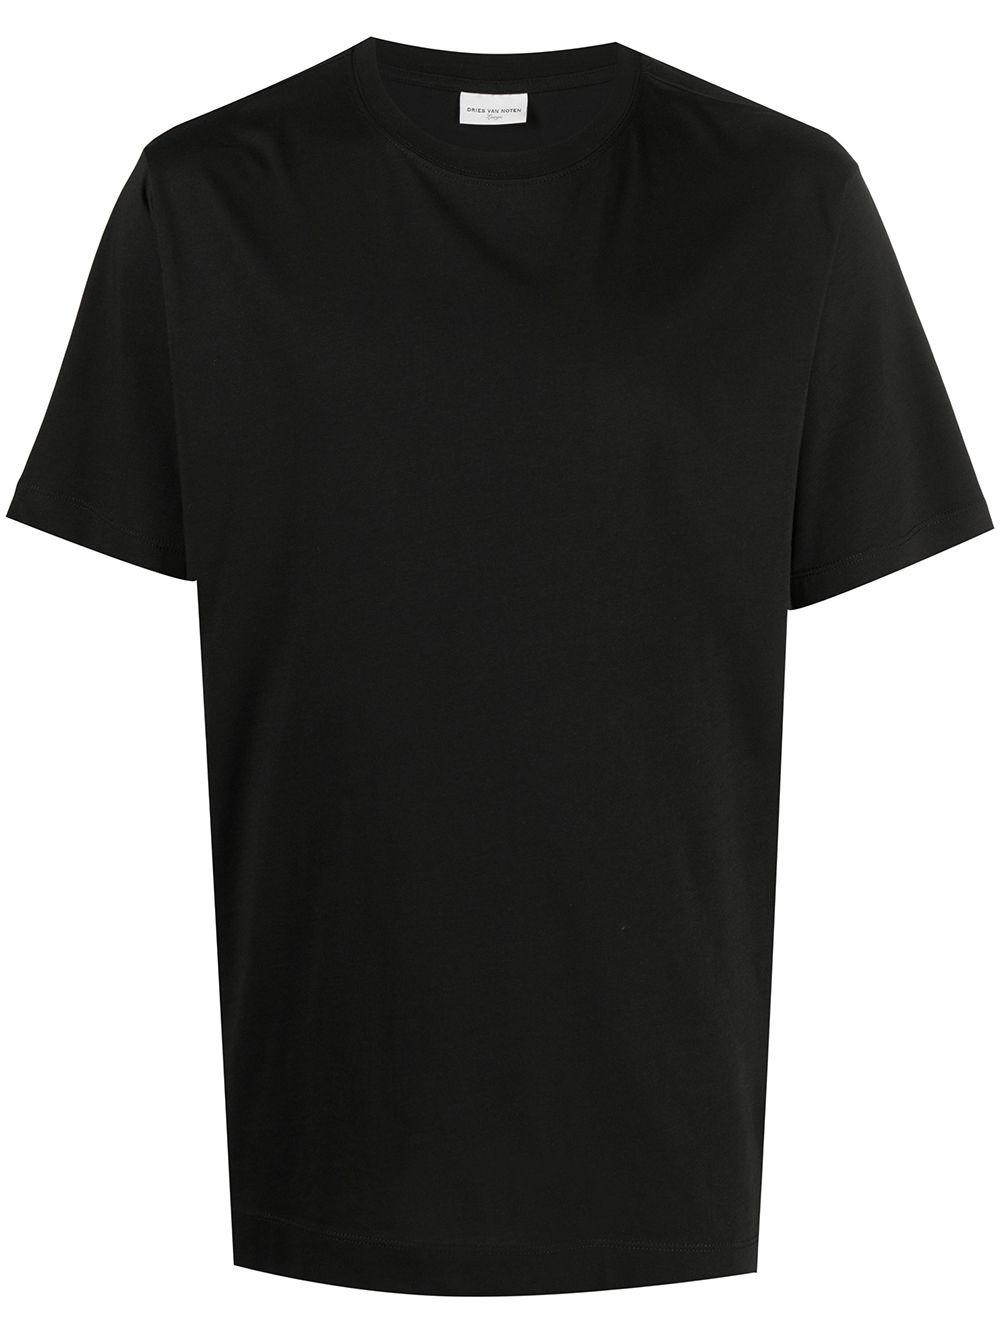 t-shirt heeb man black in cotton DRIES VAN NOTEN | T-shirts | HEEB2600BLACK